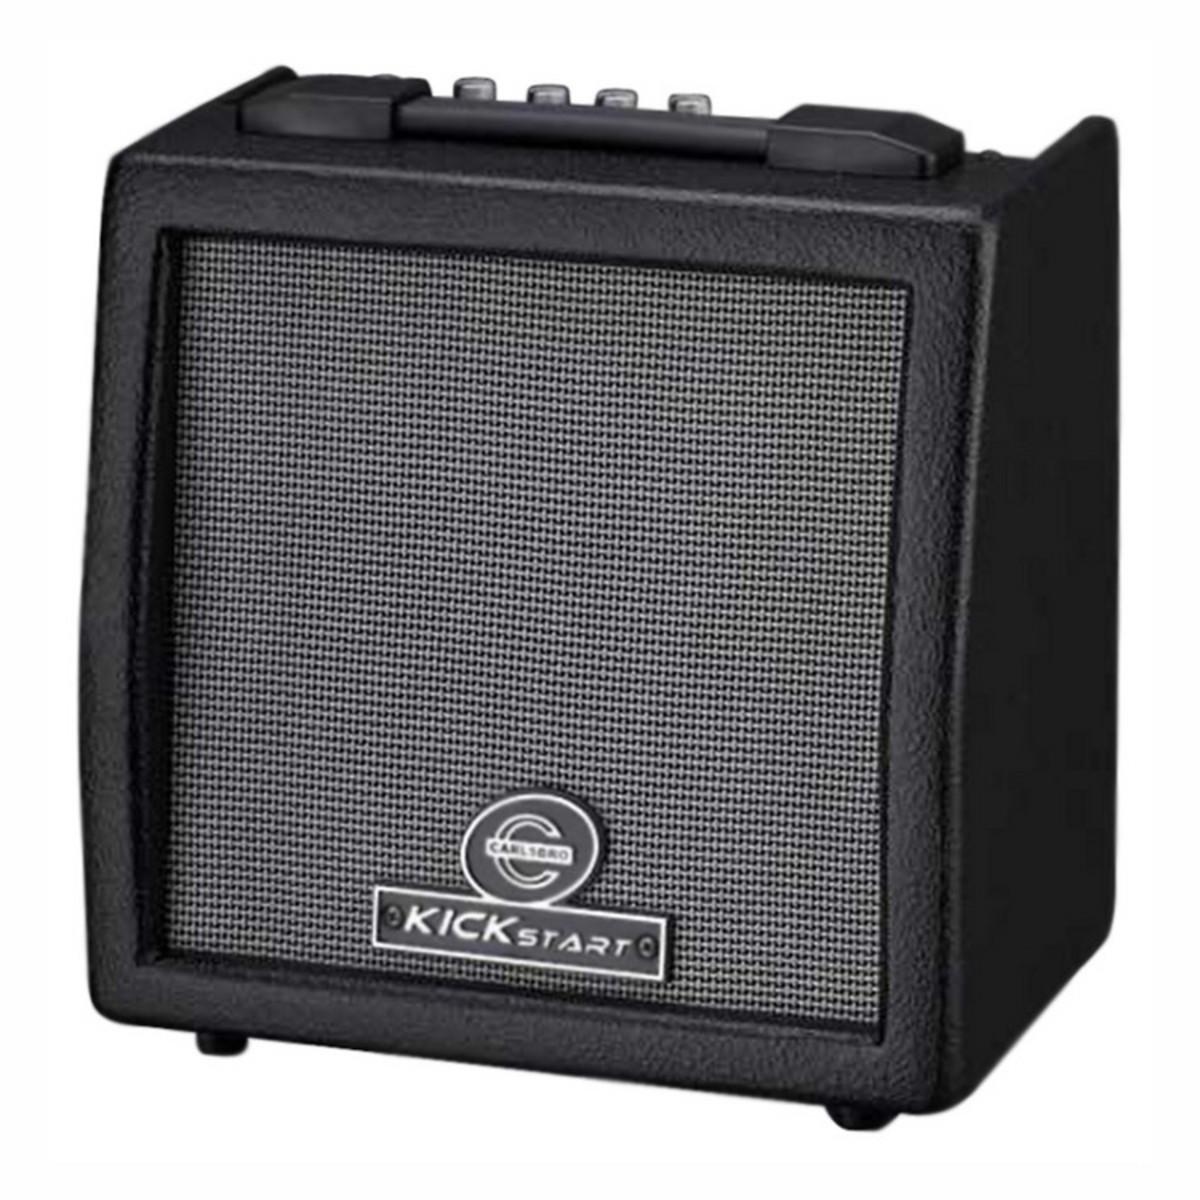 Discontinued Carlsbro Kickstart 10 12w Guitar Amp Combo At Gear4music Audio Amplifier Loading Zoom